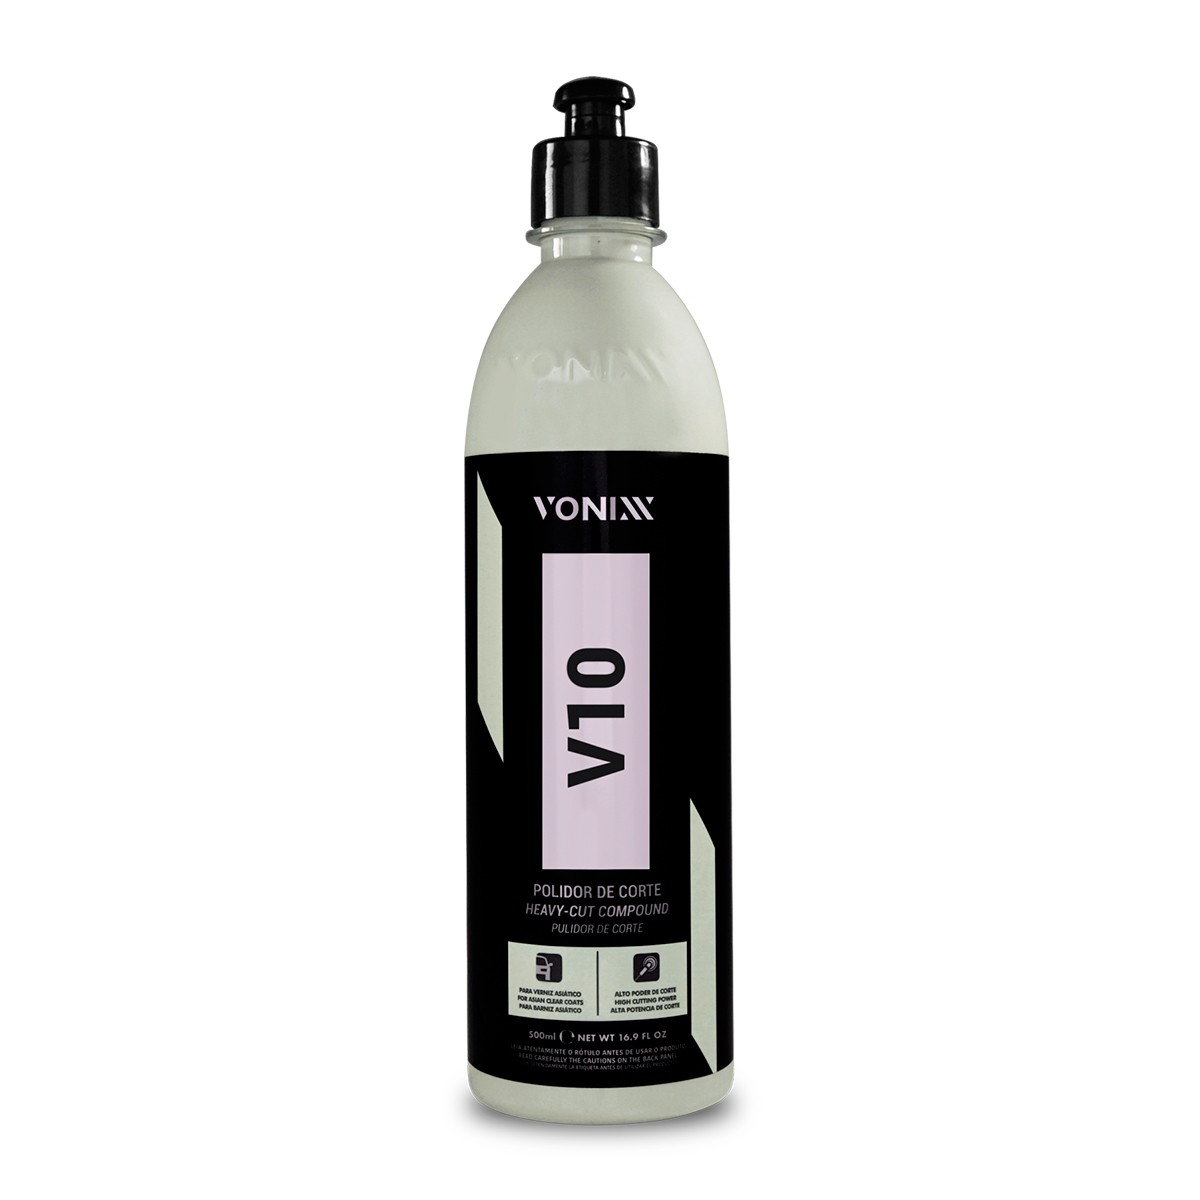 V10 Composto Polidor de Corte 500ml - Vonixx